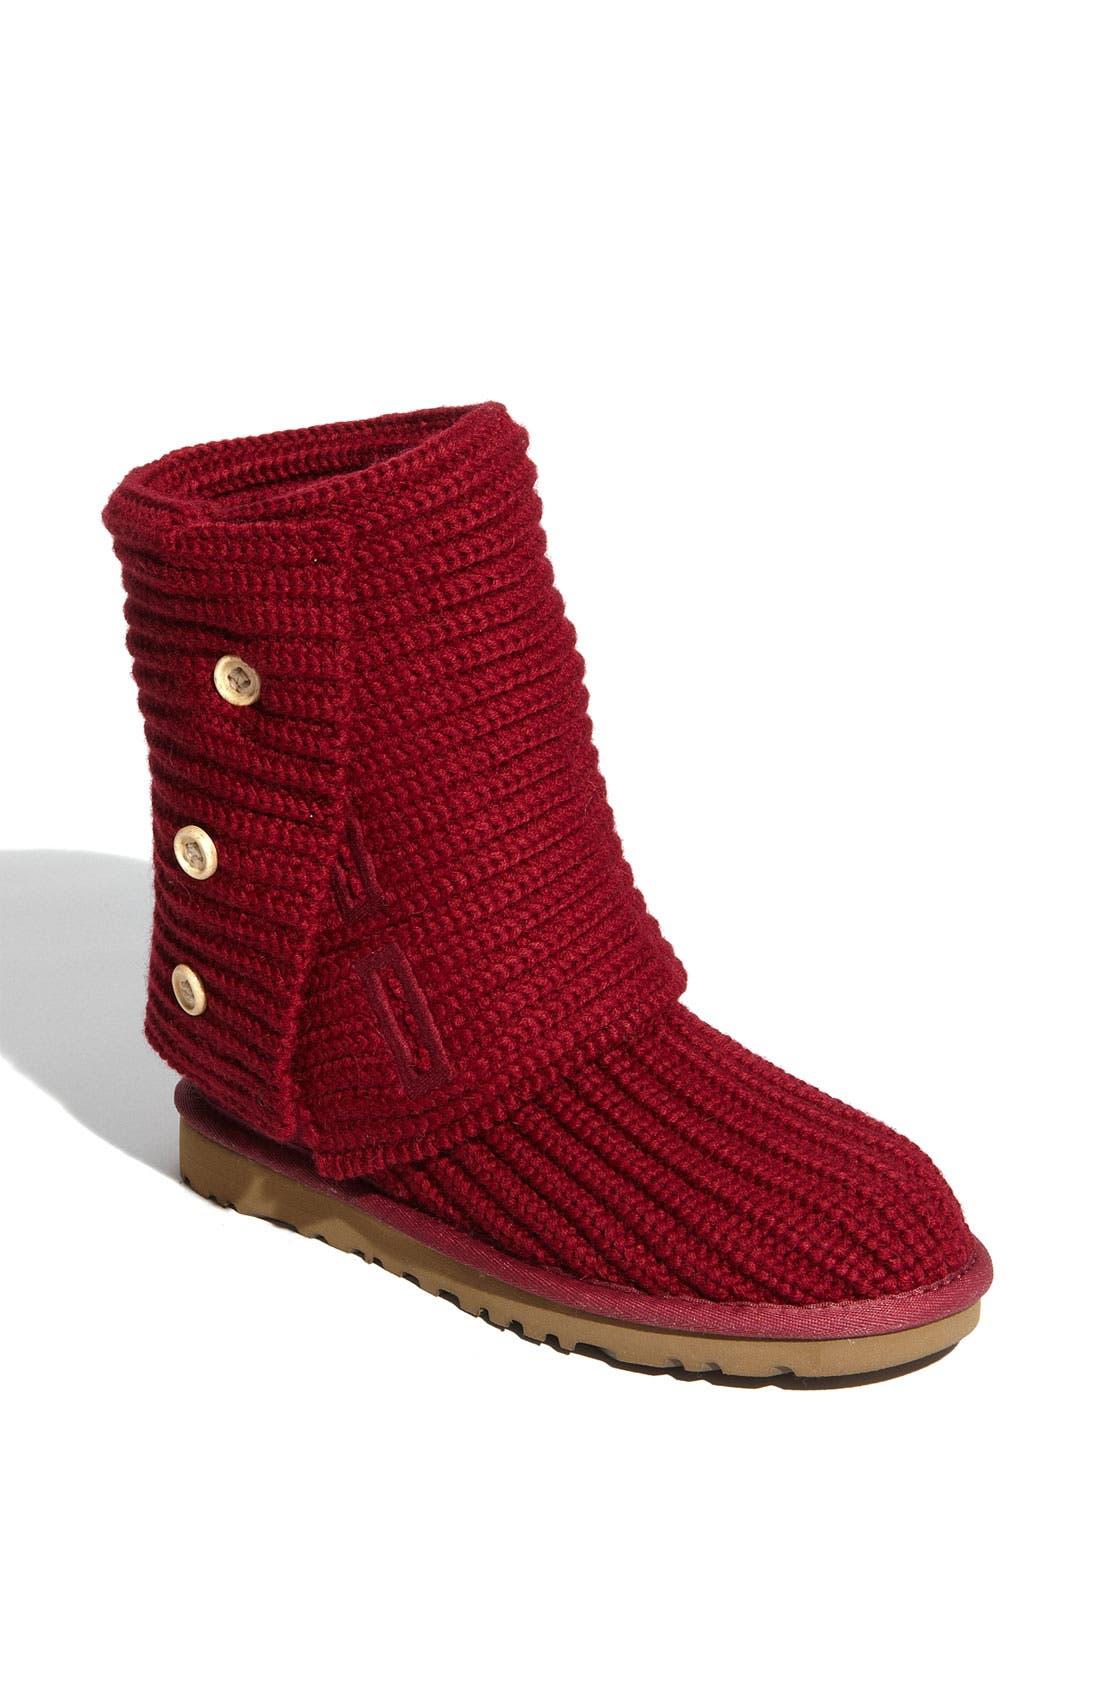 Main Image - UGG® 'Cardy' Classic Knit Boot (Women)